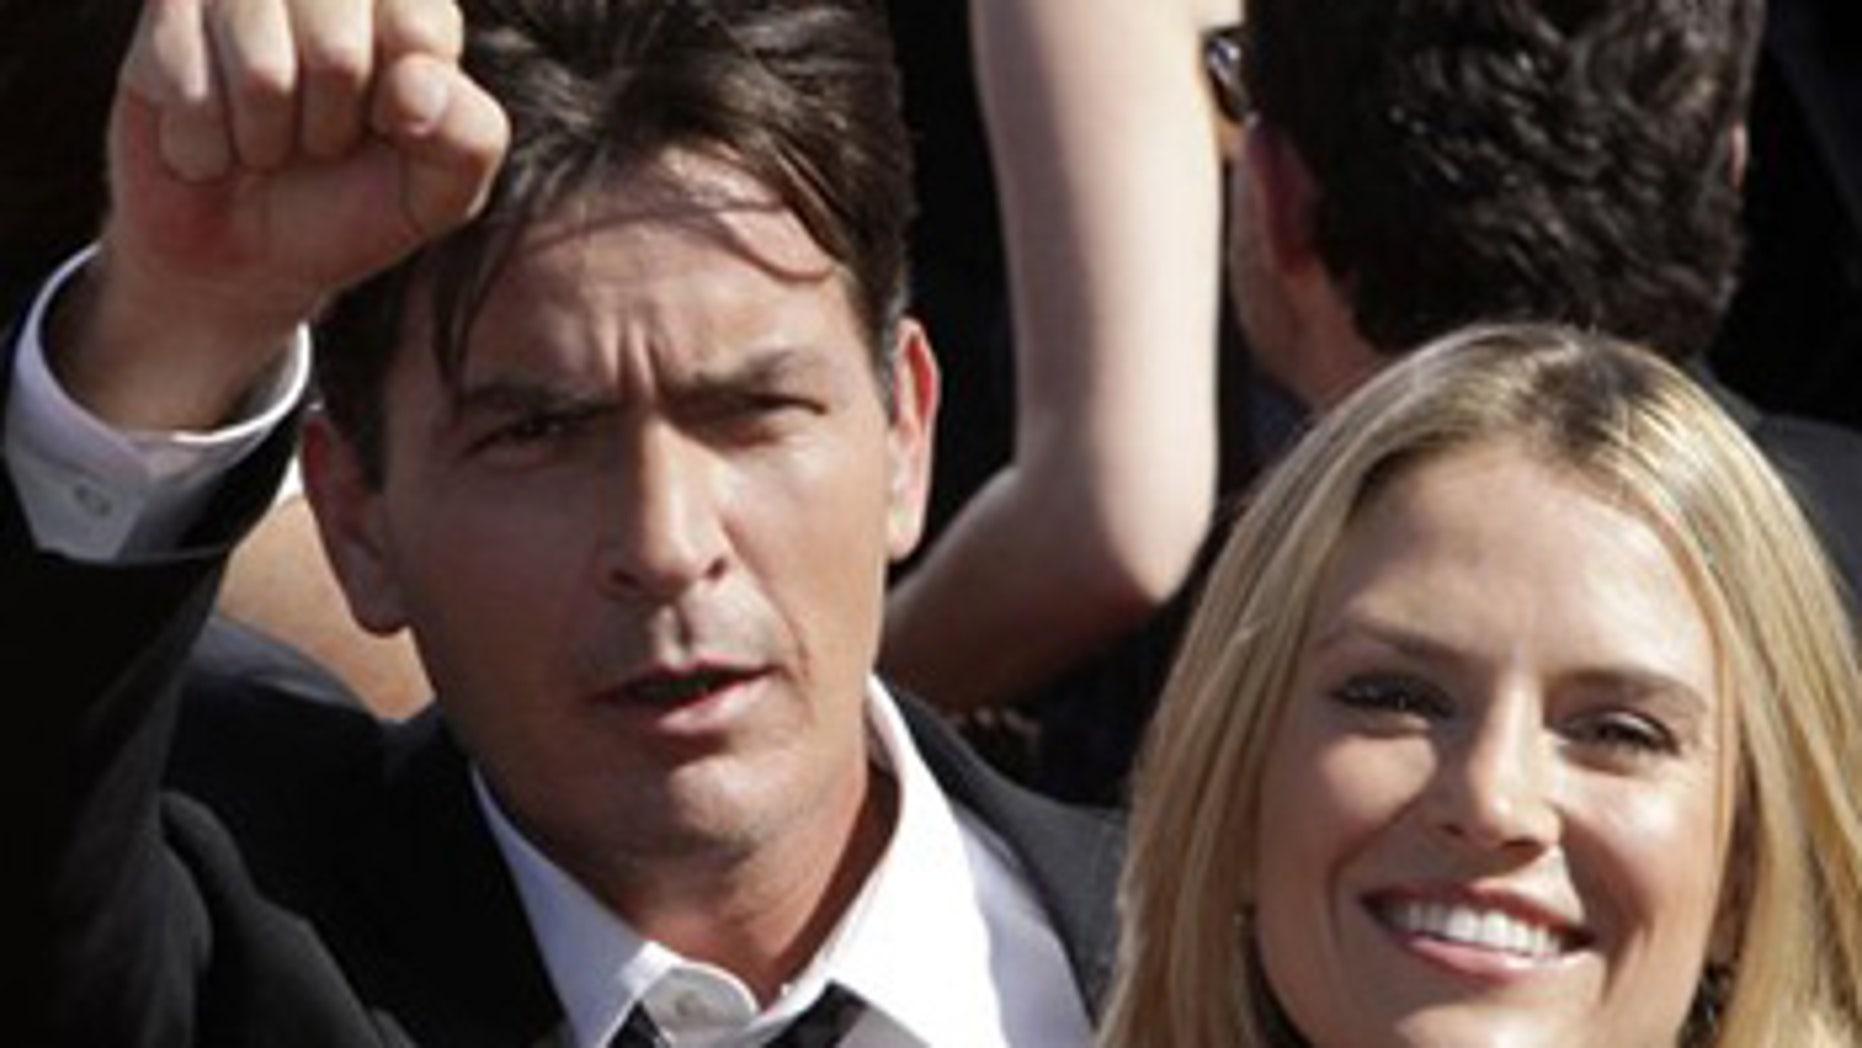 Sept. 16: Actor Charlie Sheen and Brooke Mueller arrive at the 59th Primetime Emmy Awards.